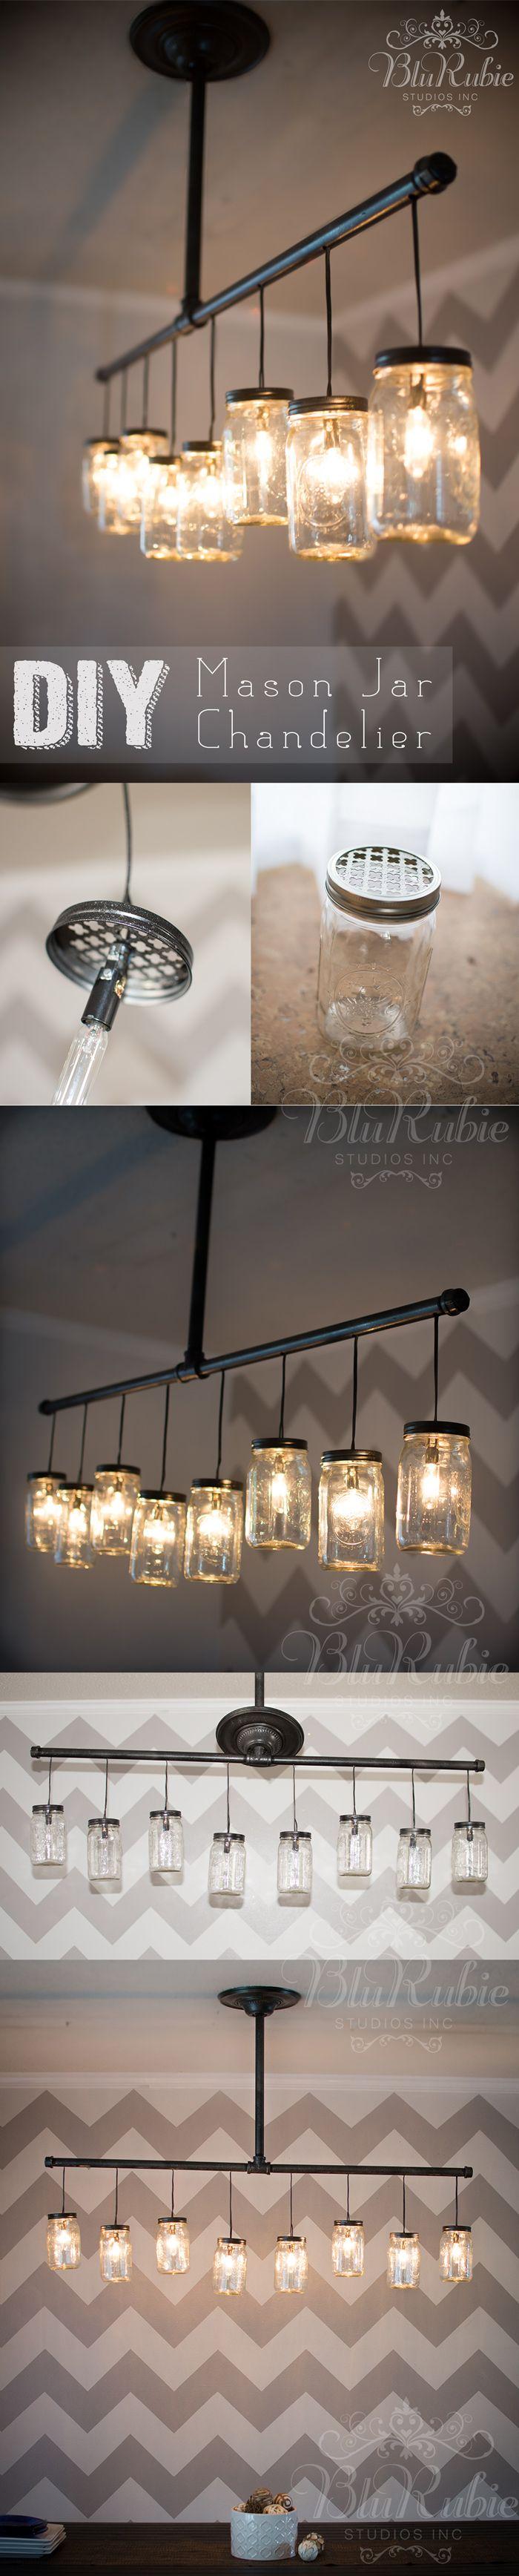 Pensacola photography and design blurubie studios diy mason jar chandelier